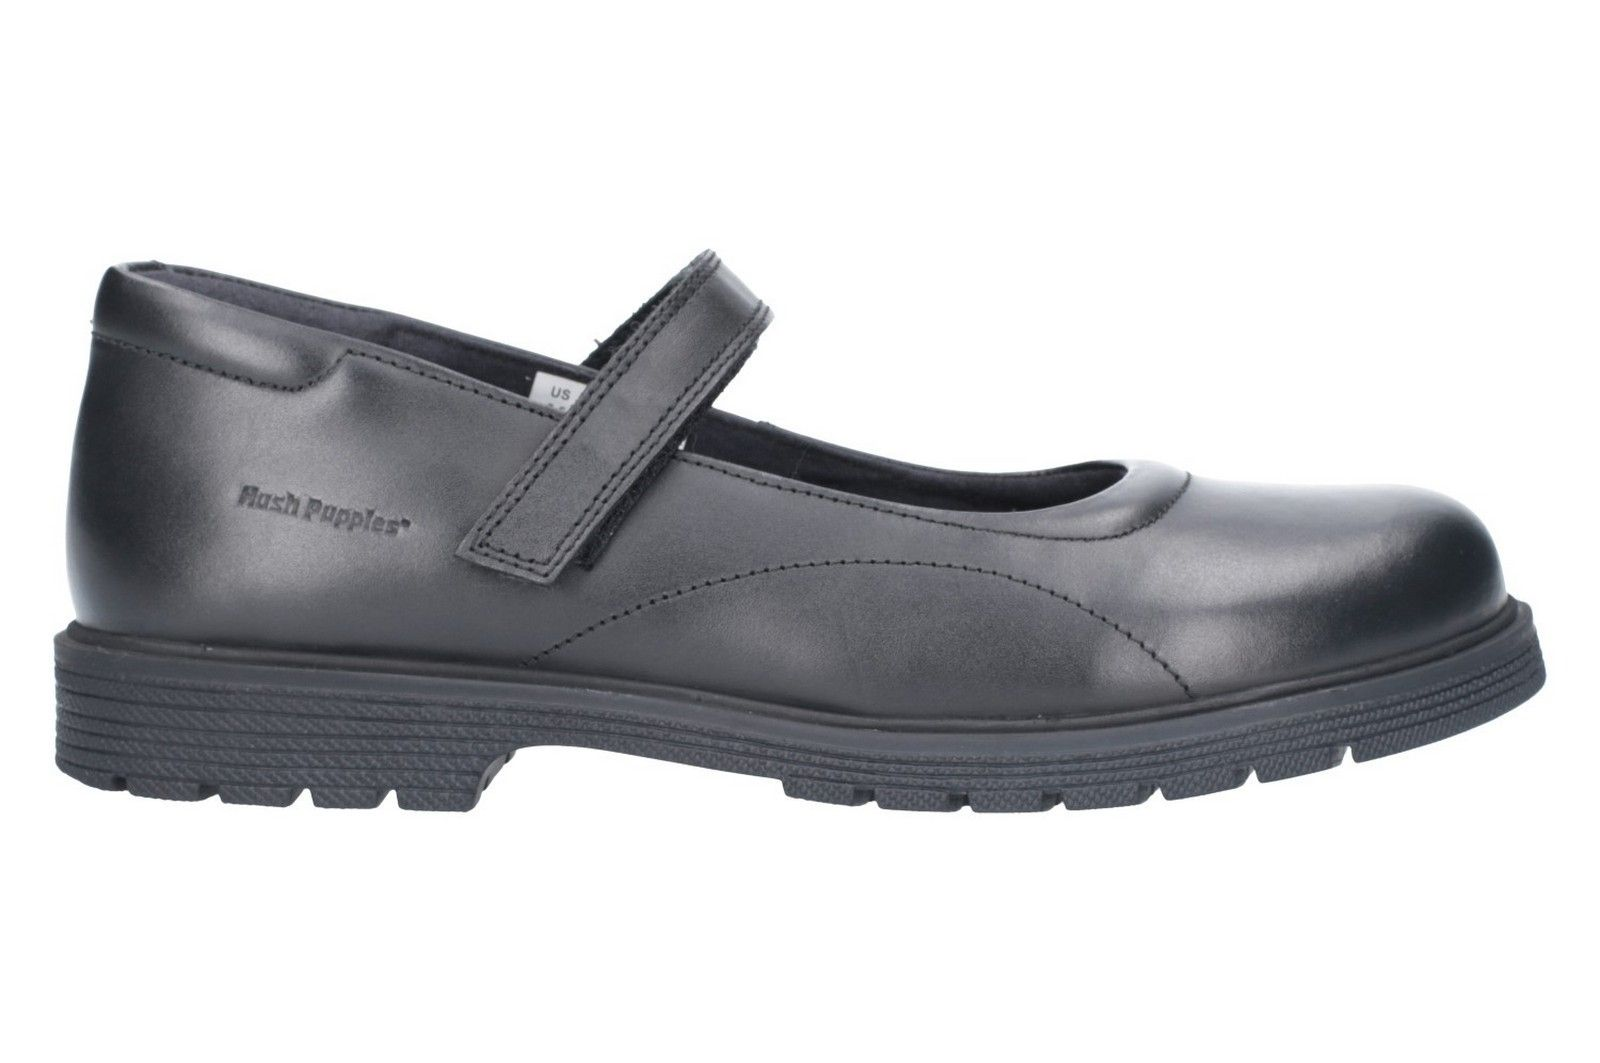 Tally Senior School Shoe